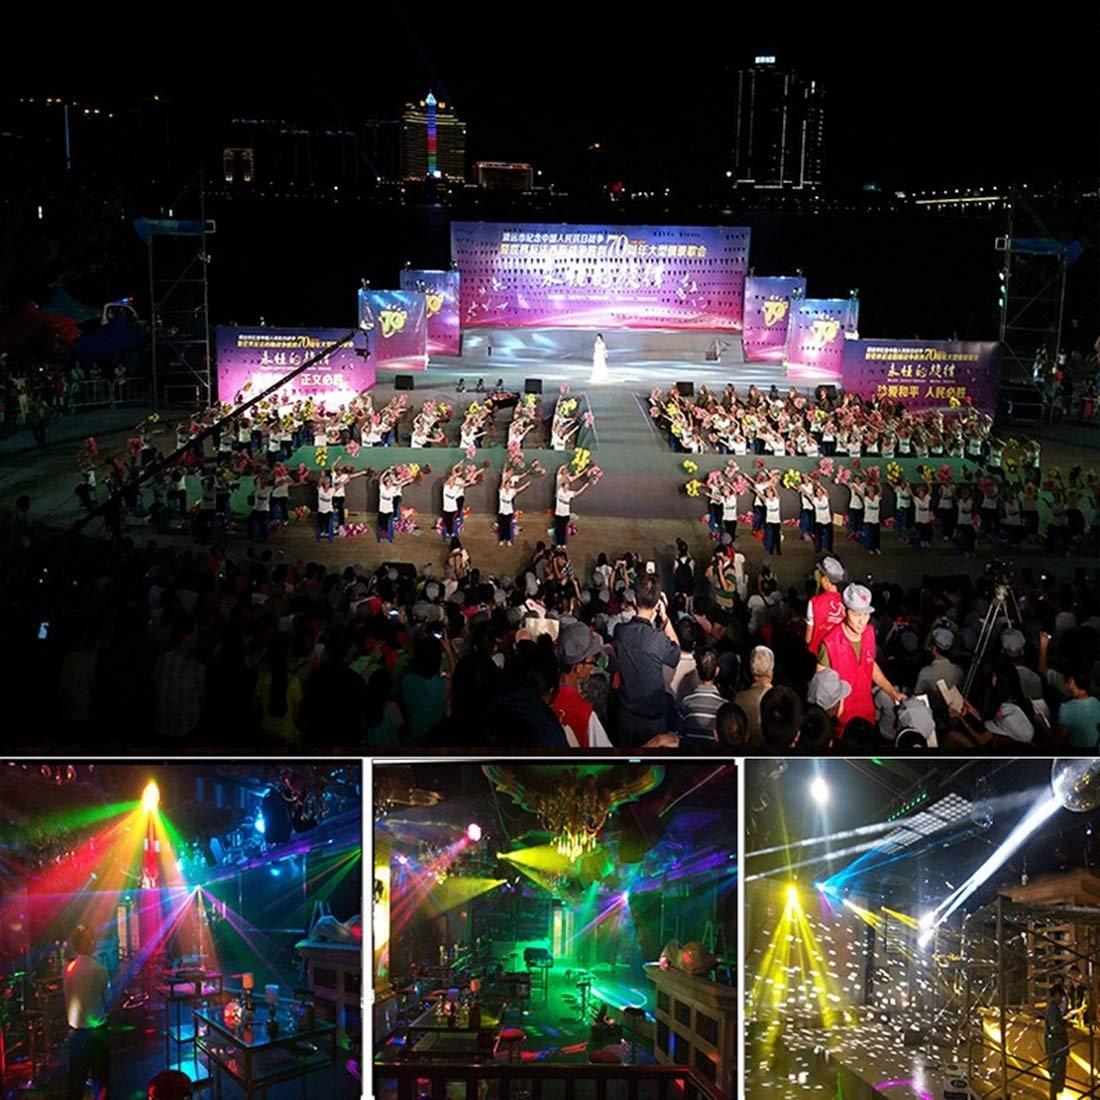 stage lighting 30W Mushroom Magic Ball LED Crystal Light, Master/Slave / DMX512 / Auto Run/Sound Control Modes, AC 220V by stage lighting (Image #8)